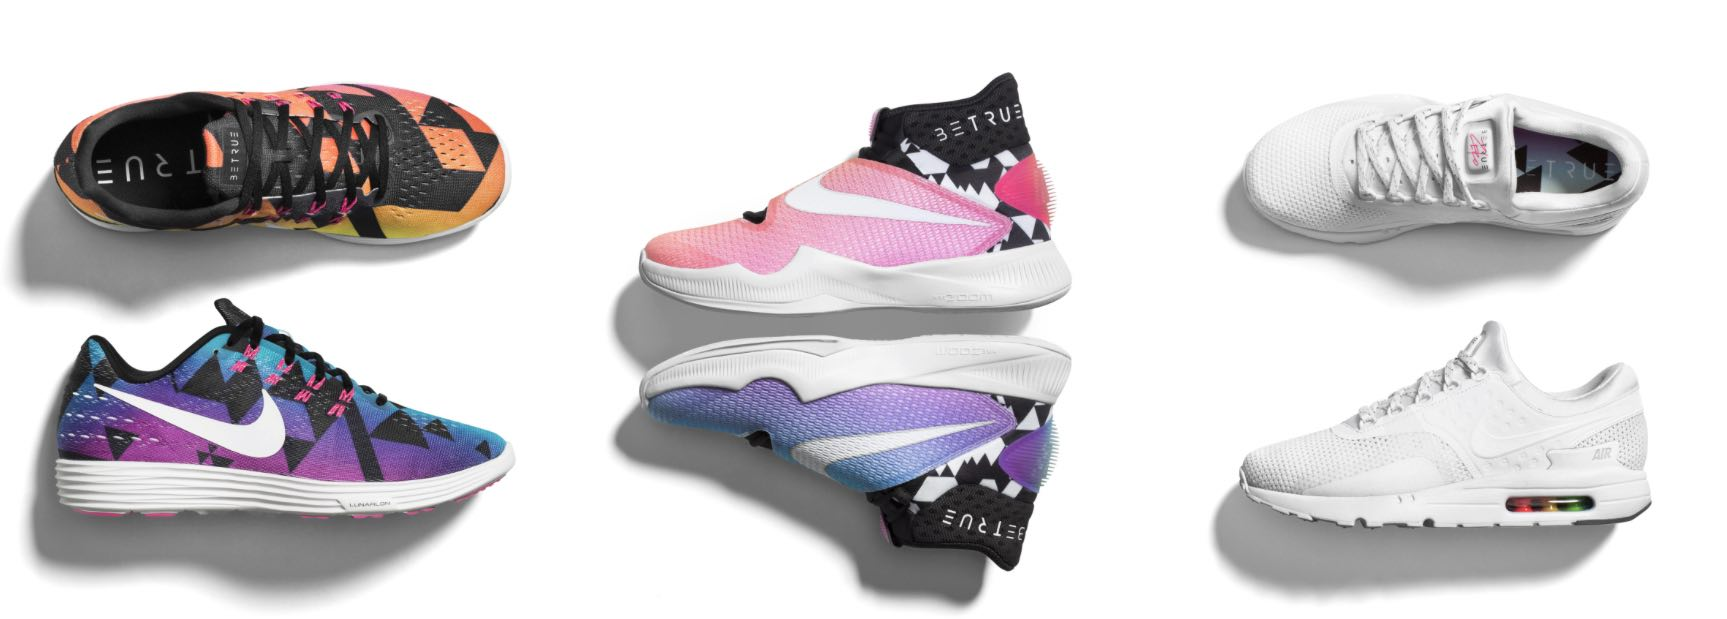 Nike BeTrue 2016